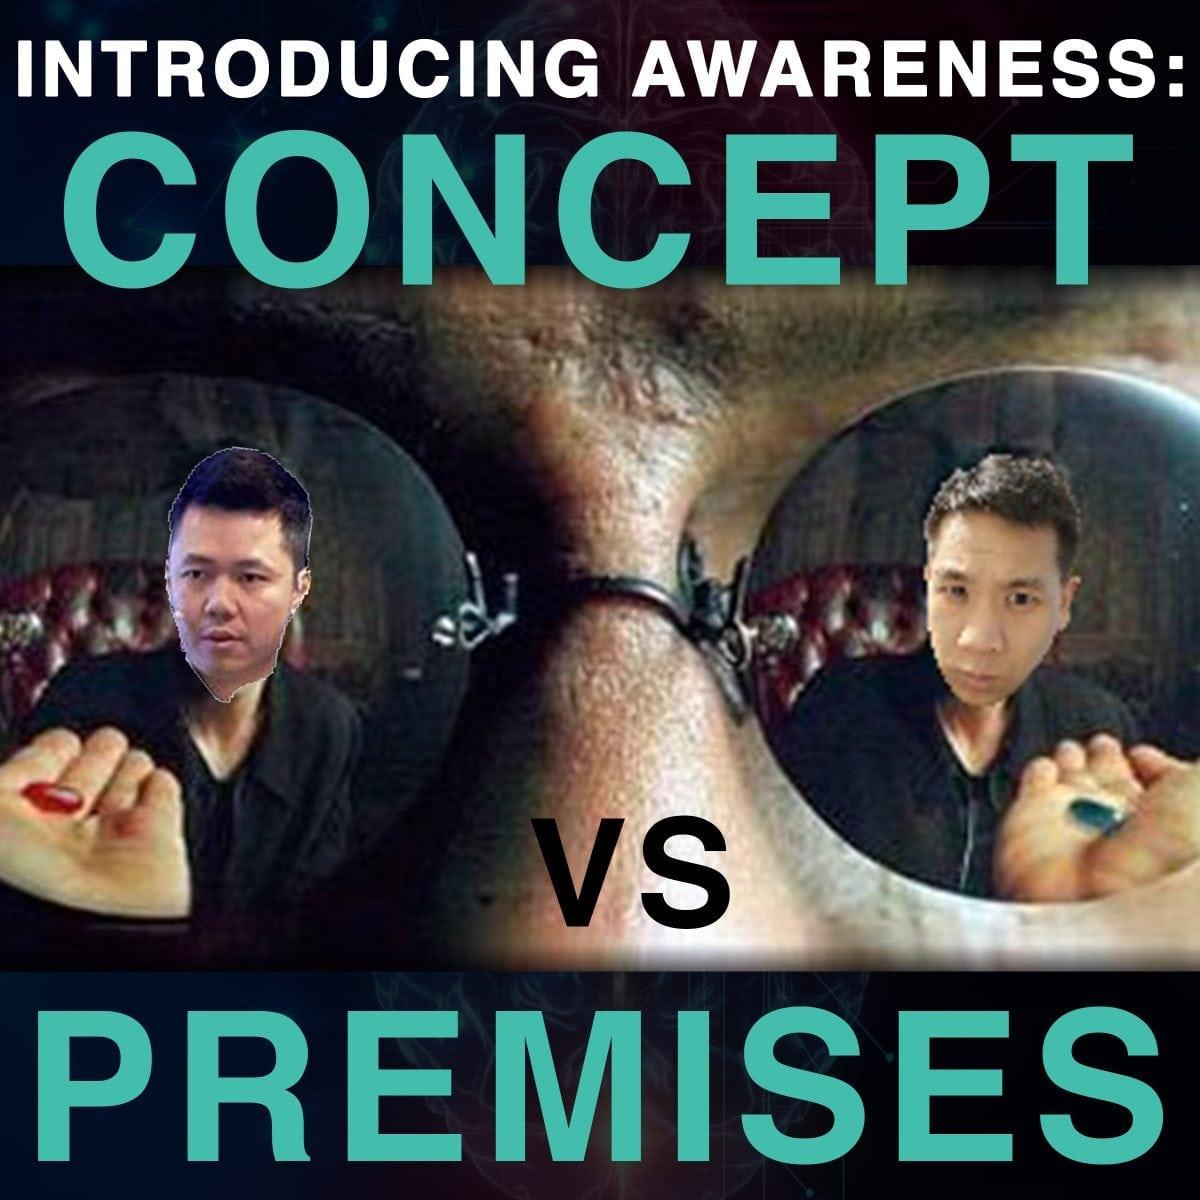 Introducing Awareness: Concept vs Premises